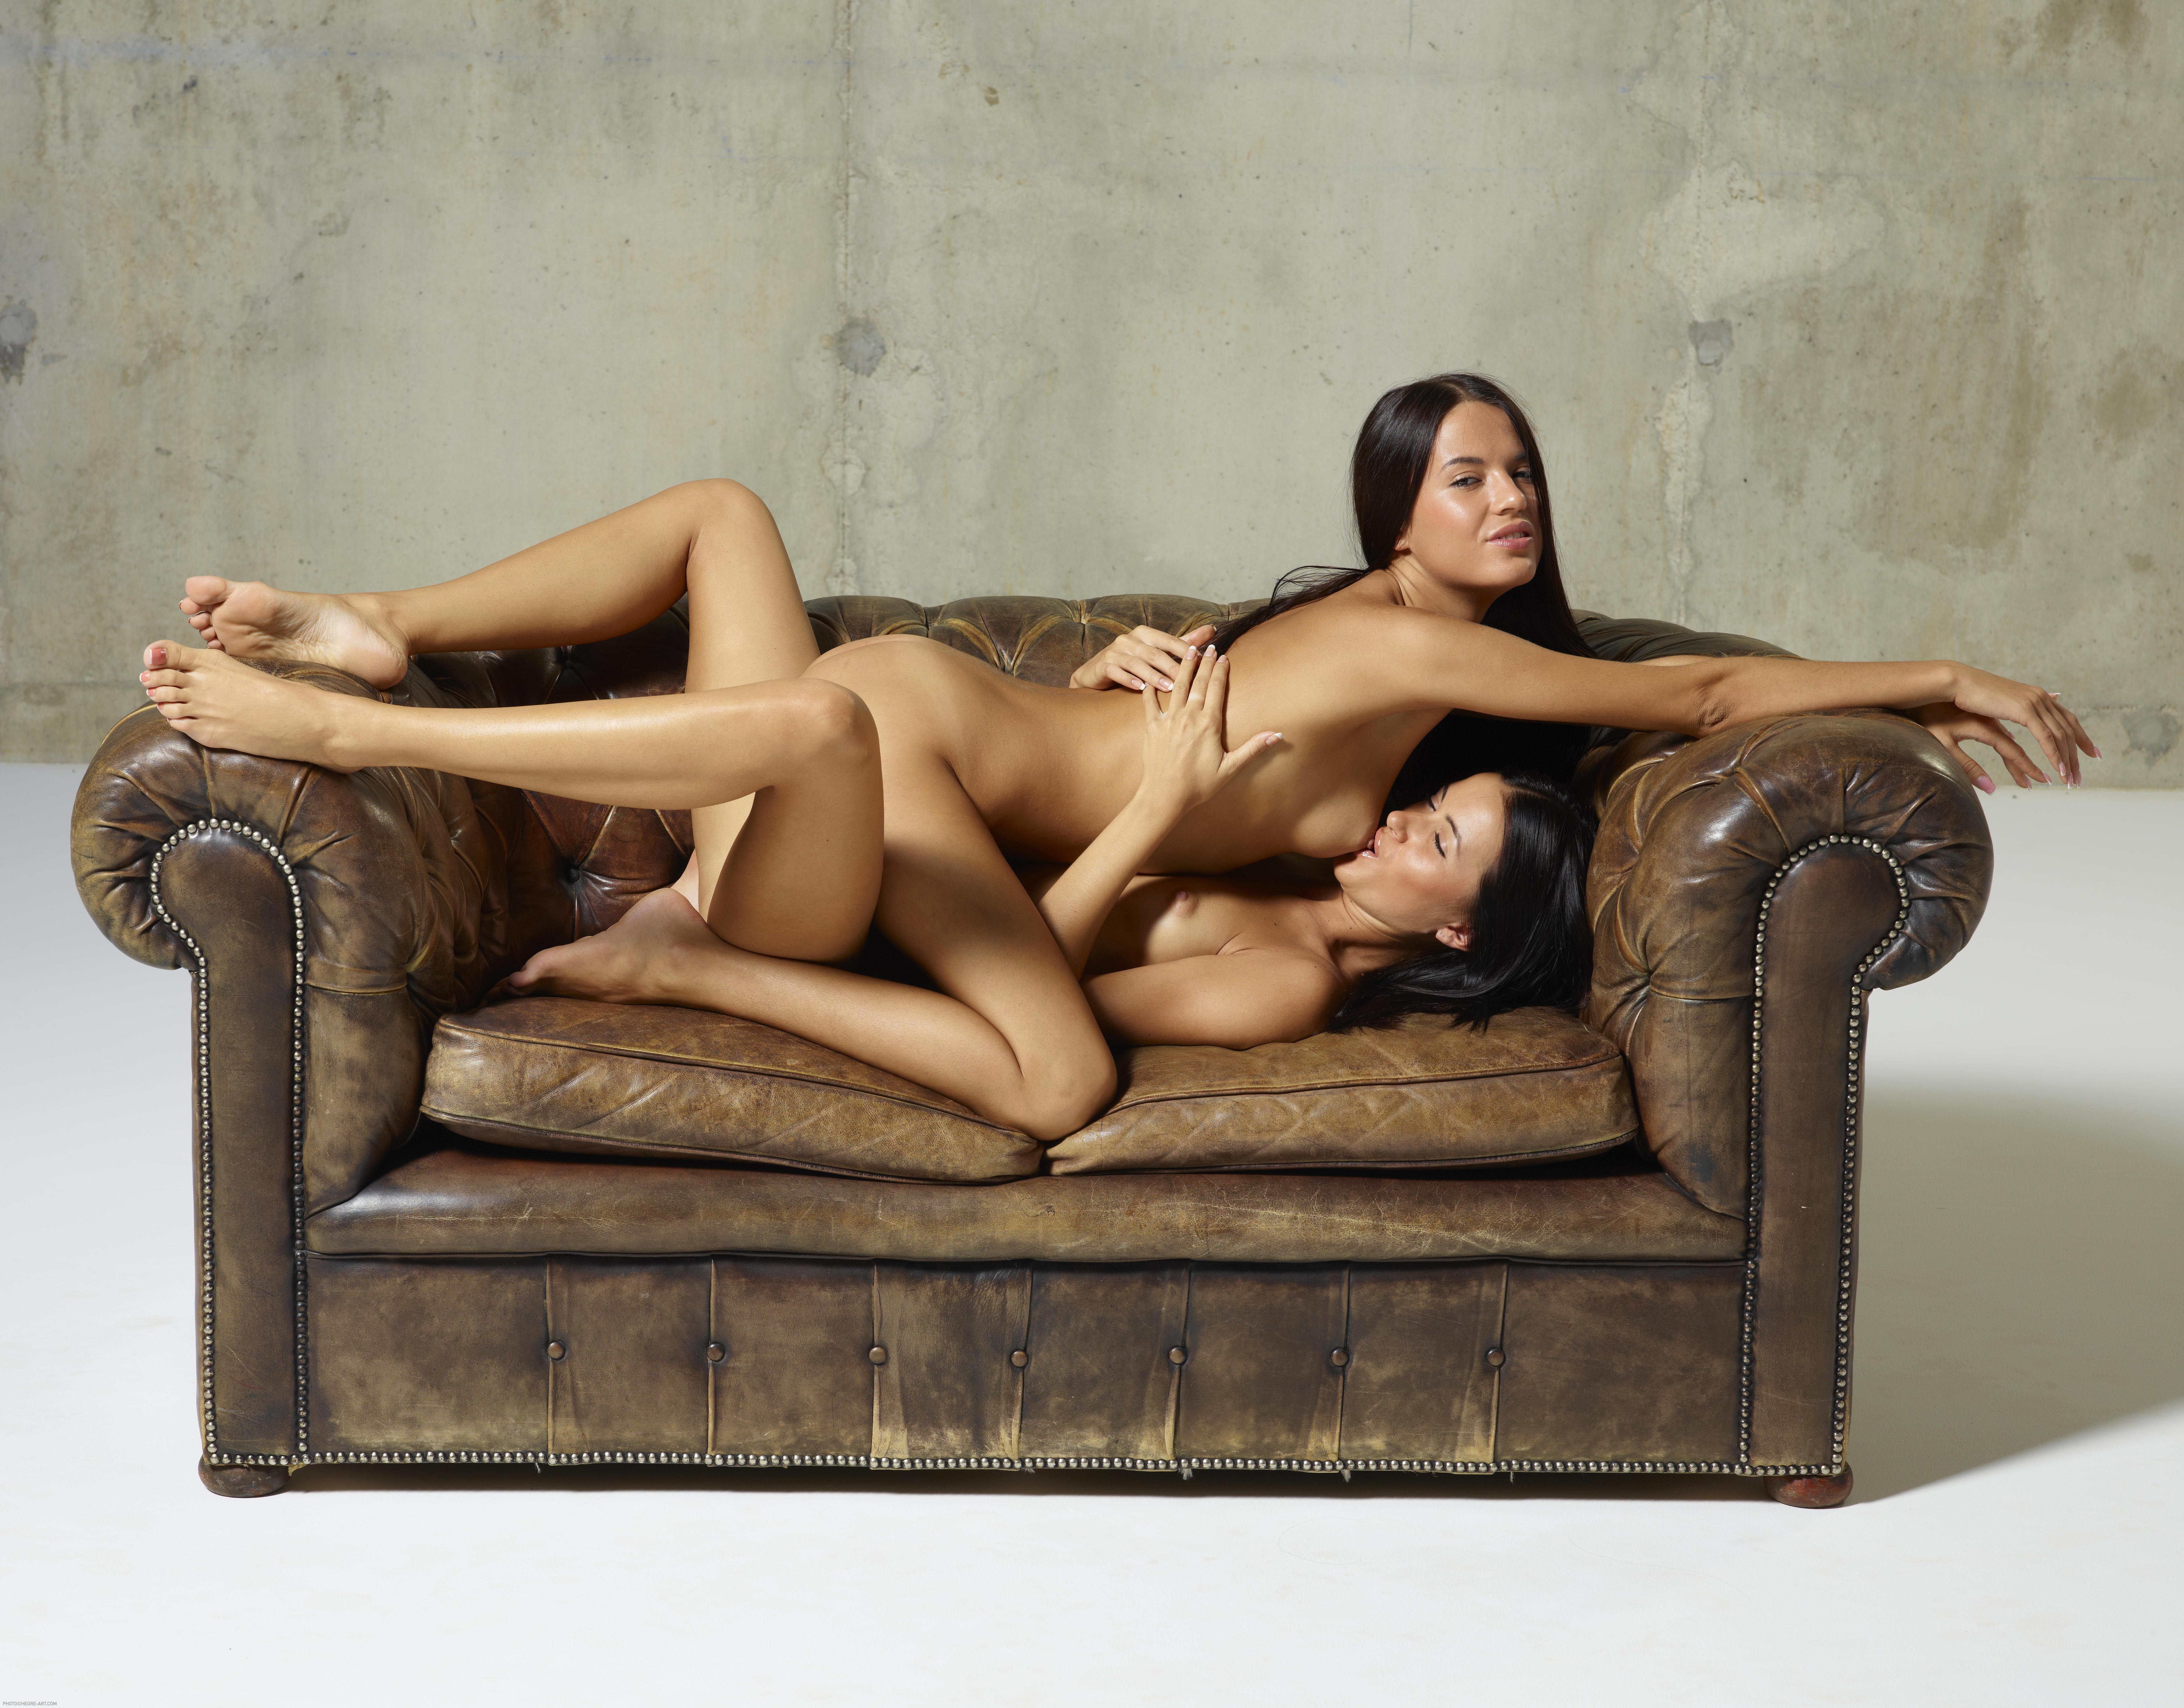 and gloria sofa sex Nicole